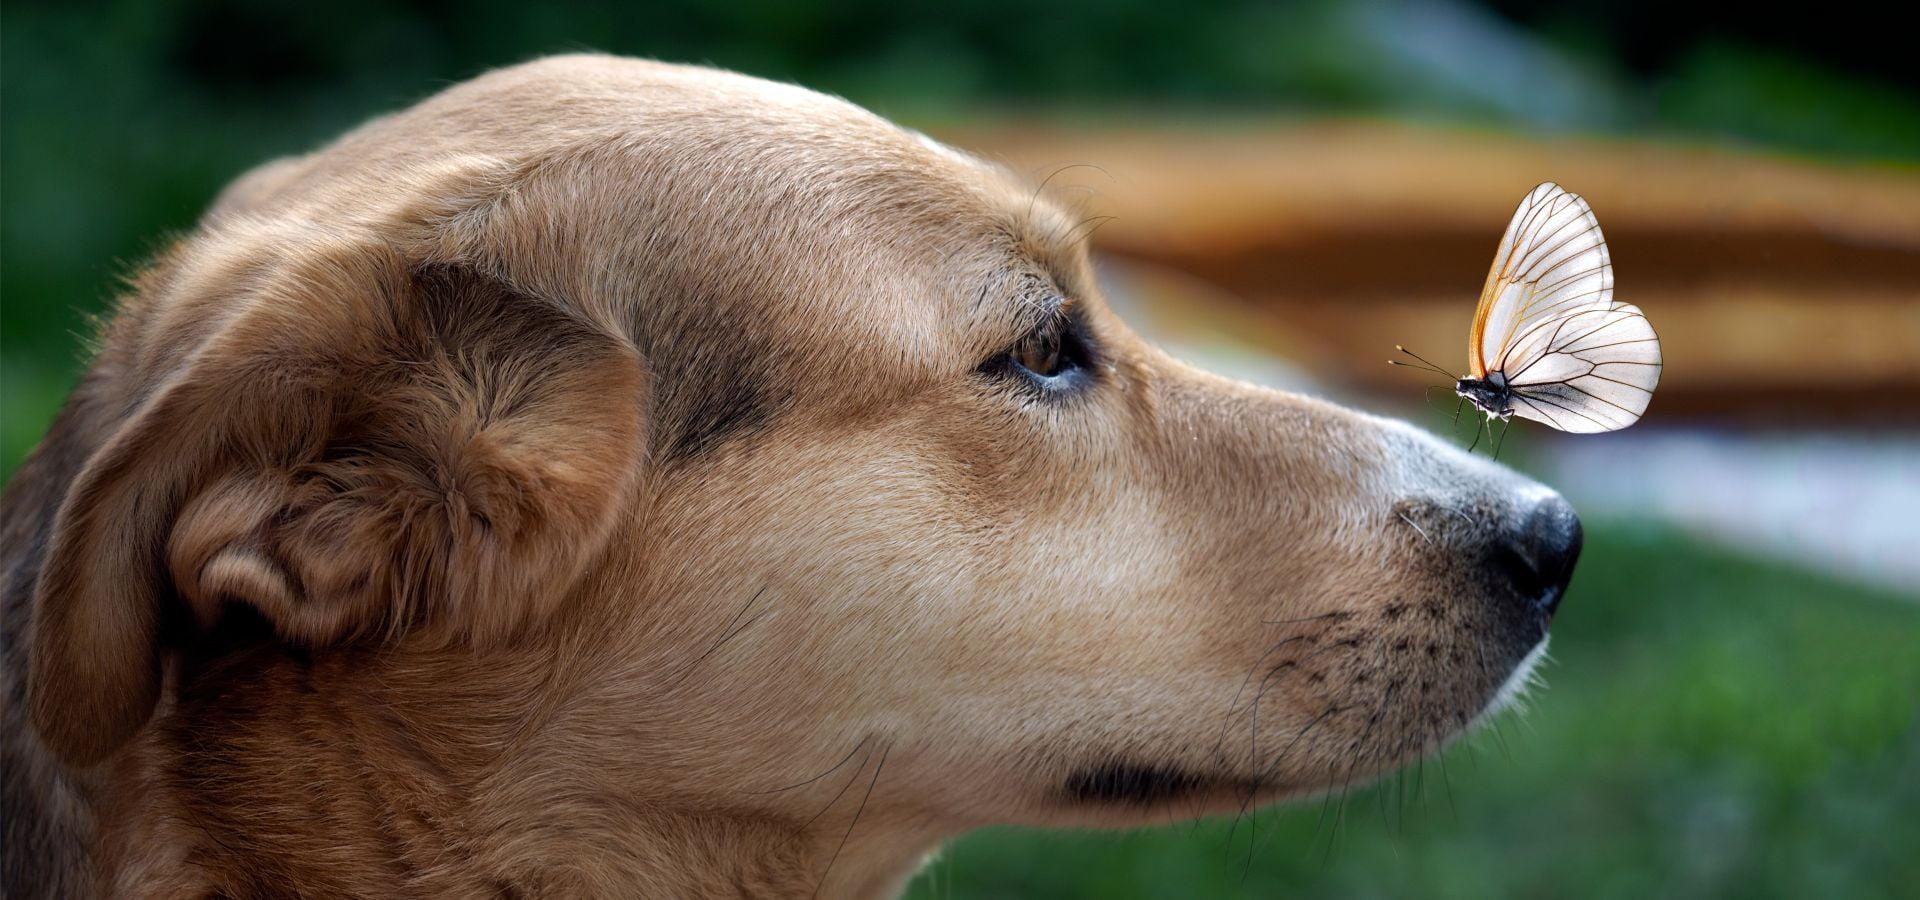 8 Martie plin de stomatologie veterinară